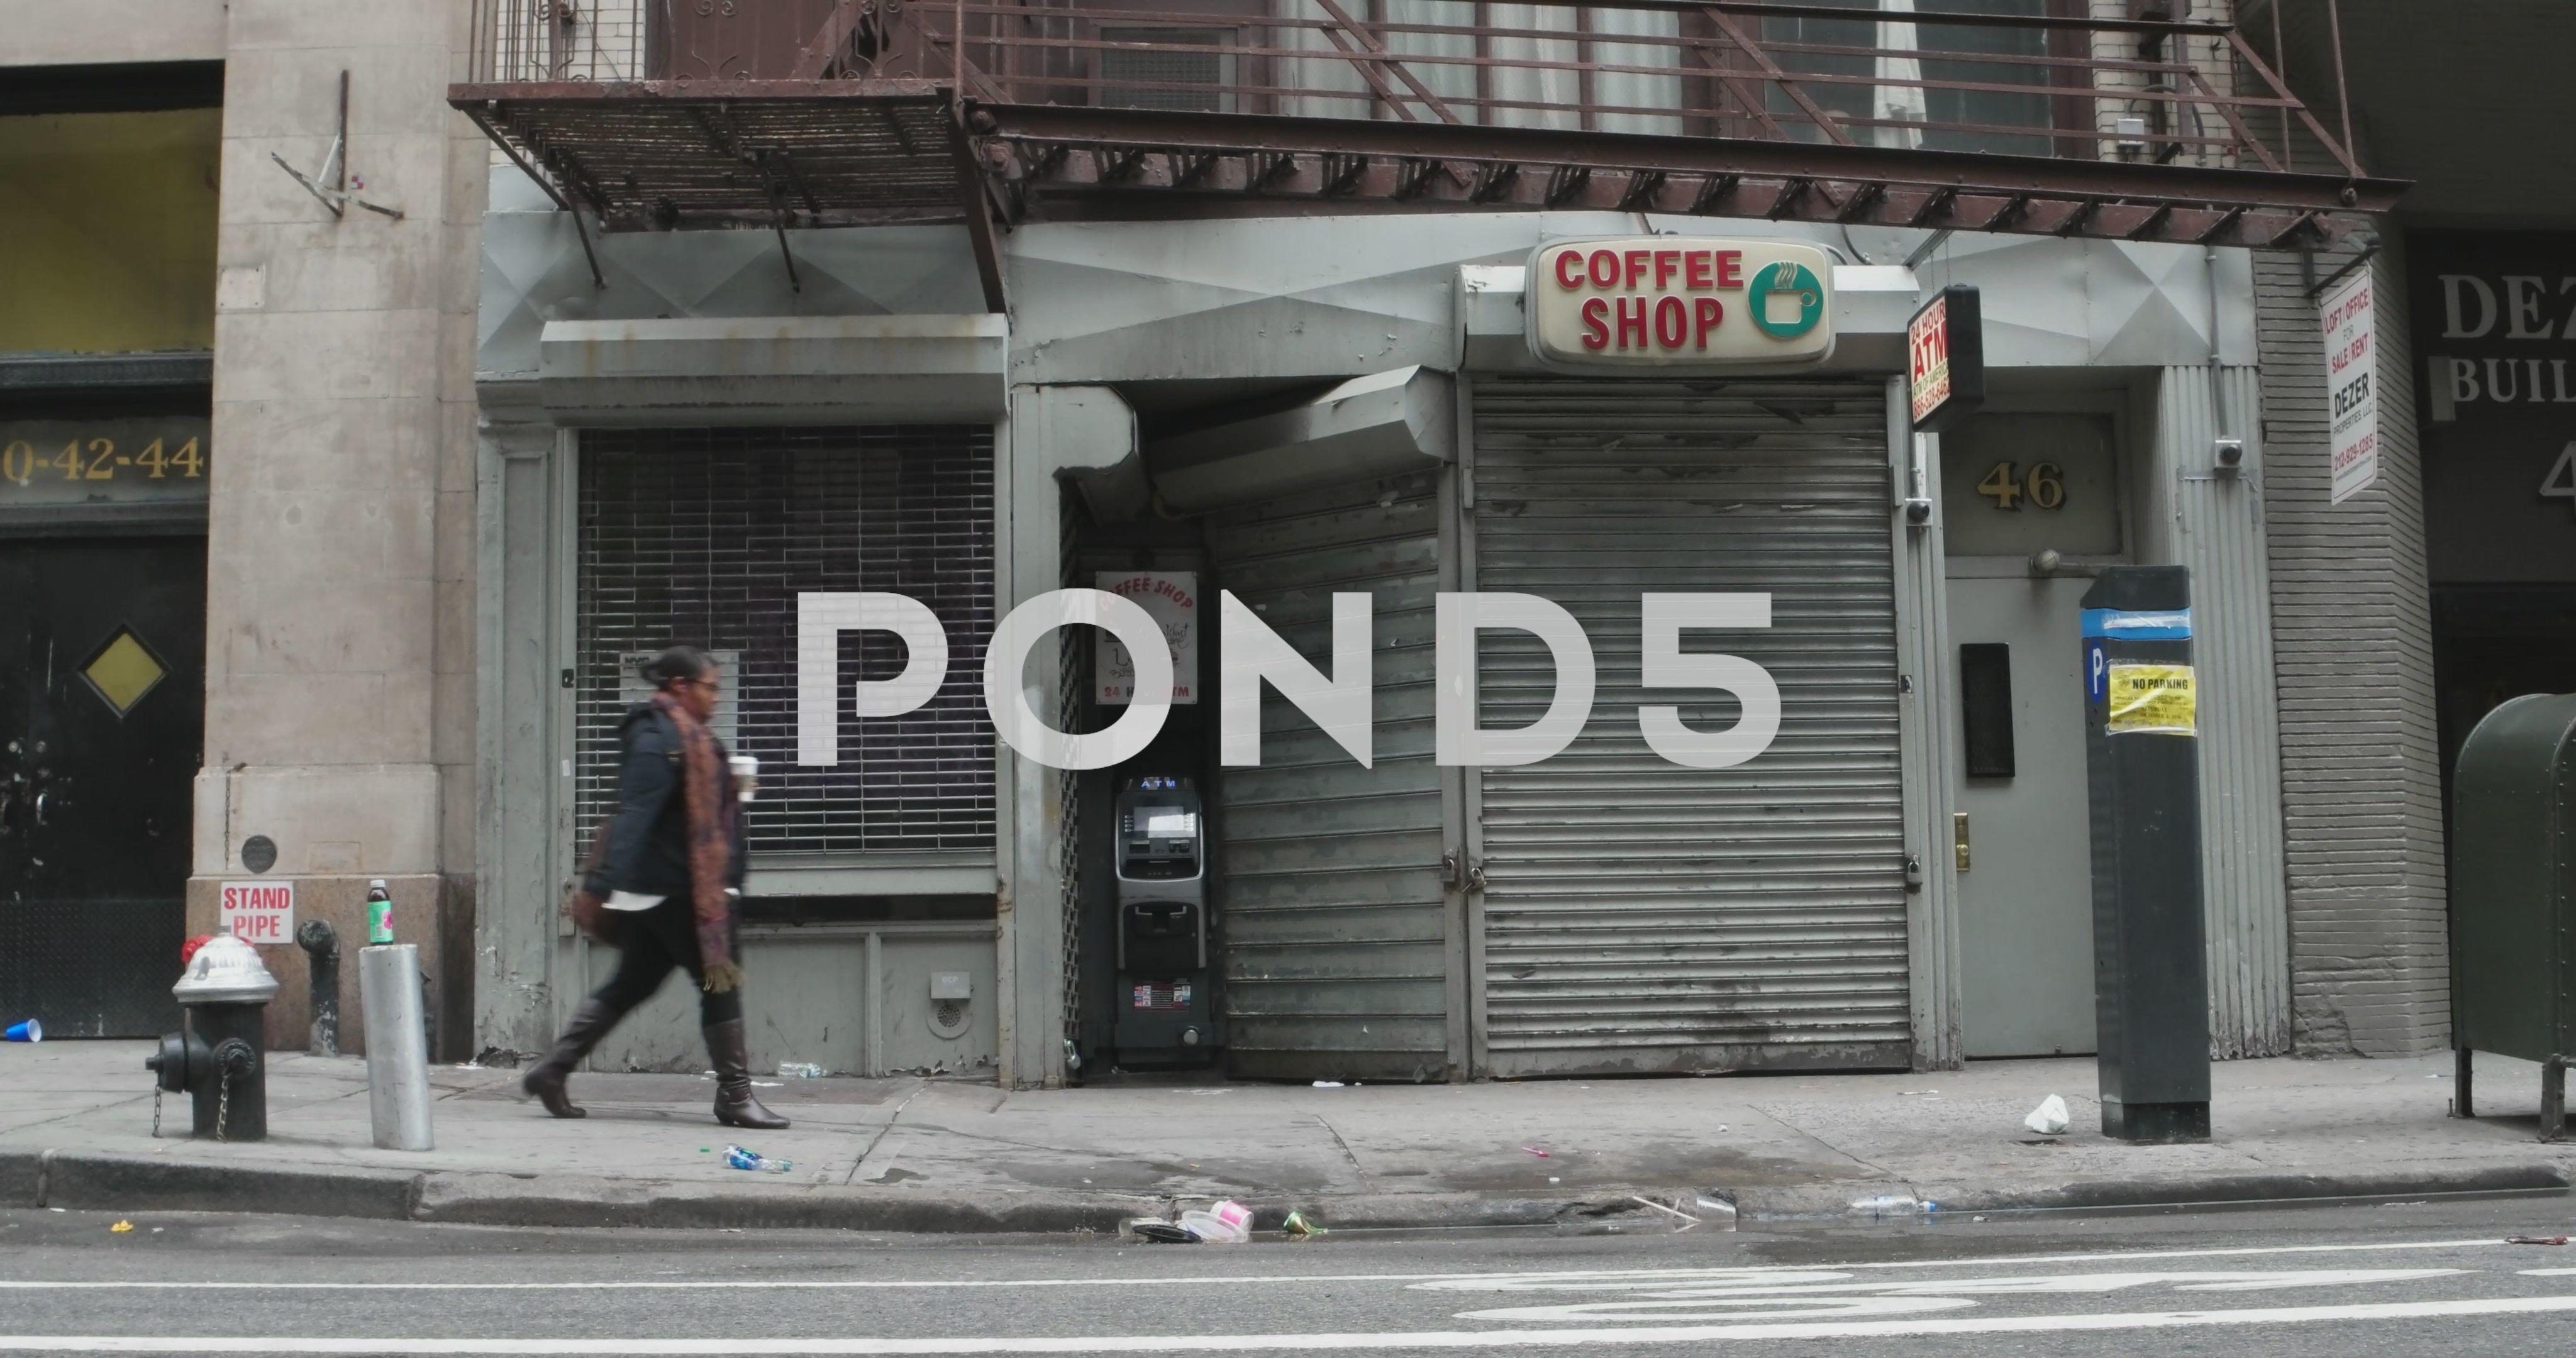 Old Coffee Shop Storefront in Manhattan New York City 4K